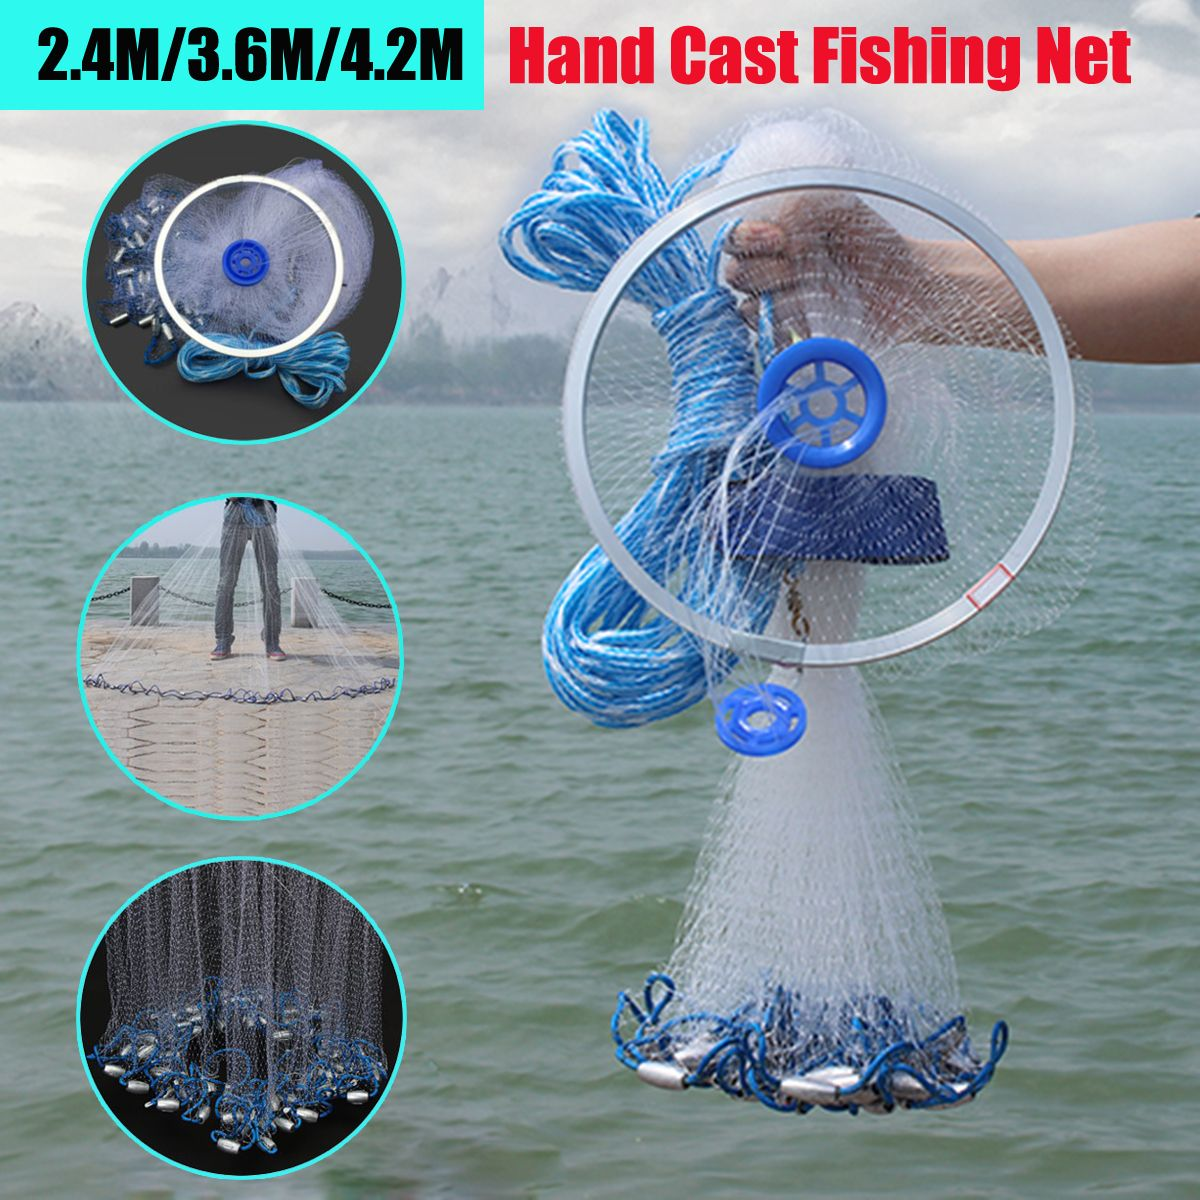 Bobing New Arrival 3.6m/2.4m Big Hand Cast Fishing Nylon Net Gill Spin Network Bait Net w/ Sinker Carp Fishing Tackle Accessory